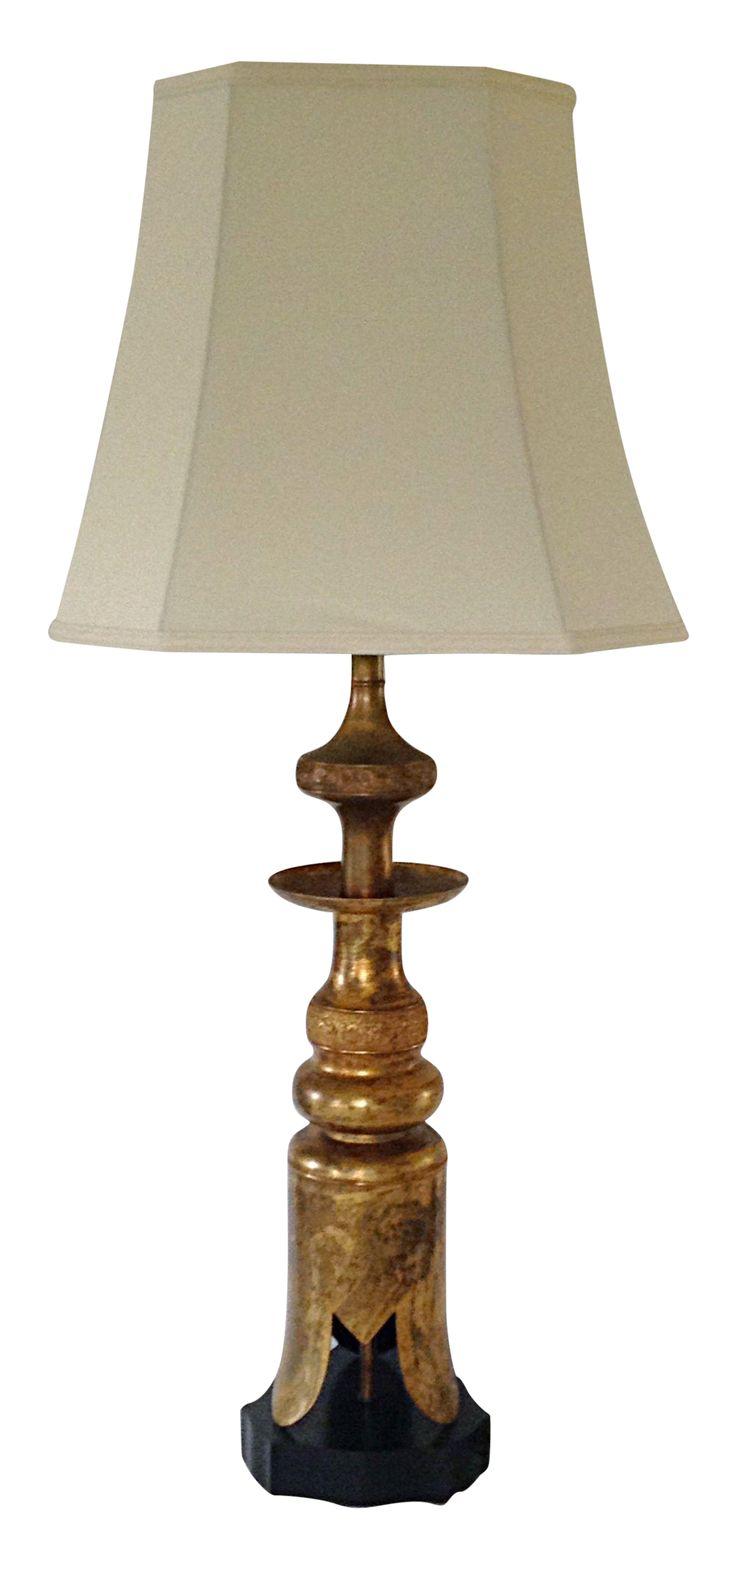 Viyet designer furniture lighting fendi casa tall table lamps - Tall Gilt Asian Table Lamp With Shade